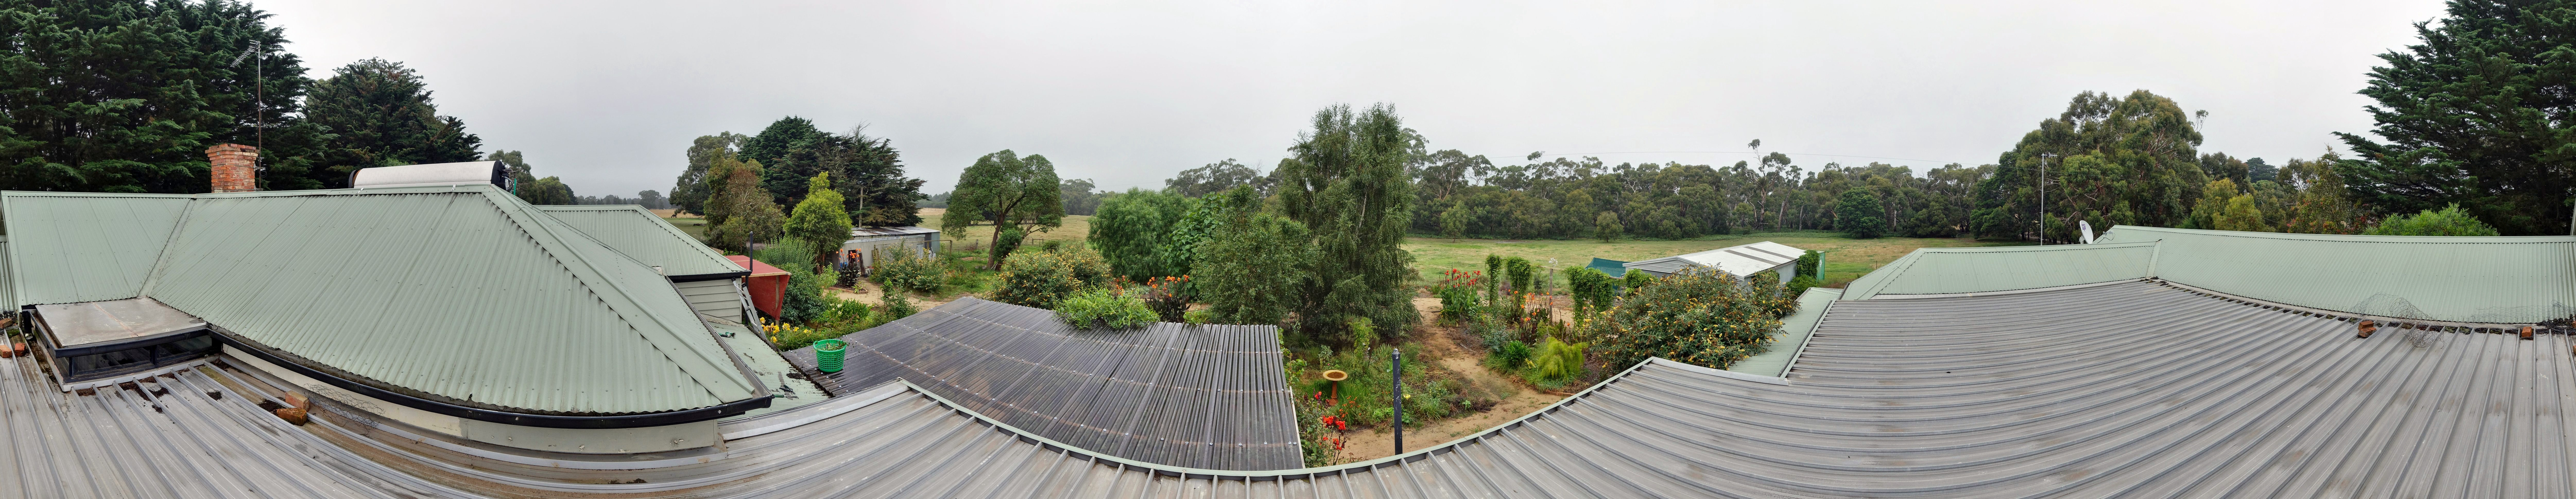 roof-panorama-2.jpeg